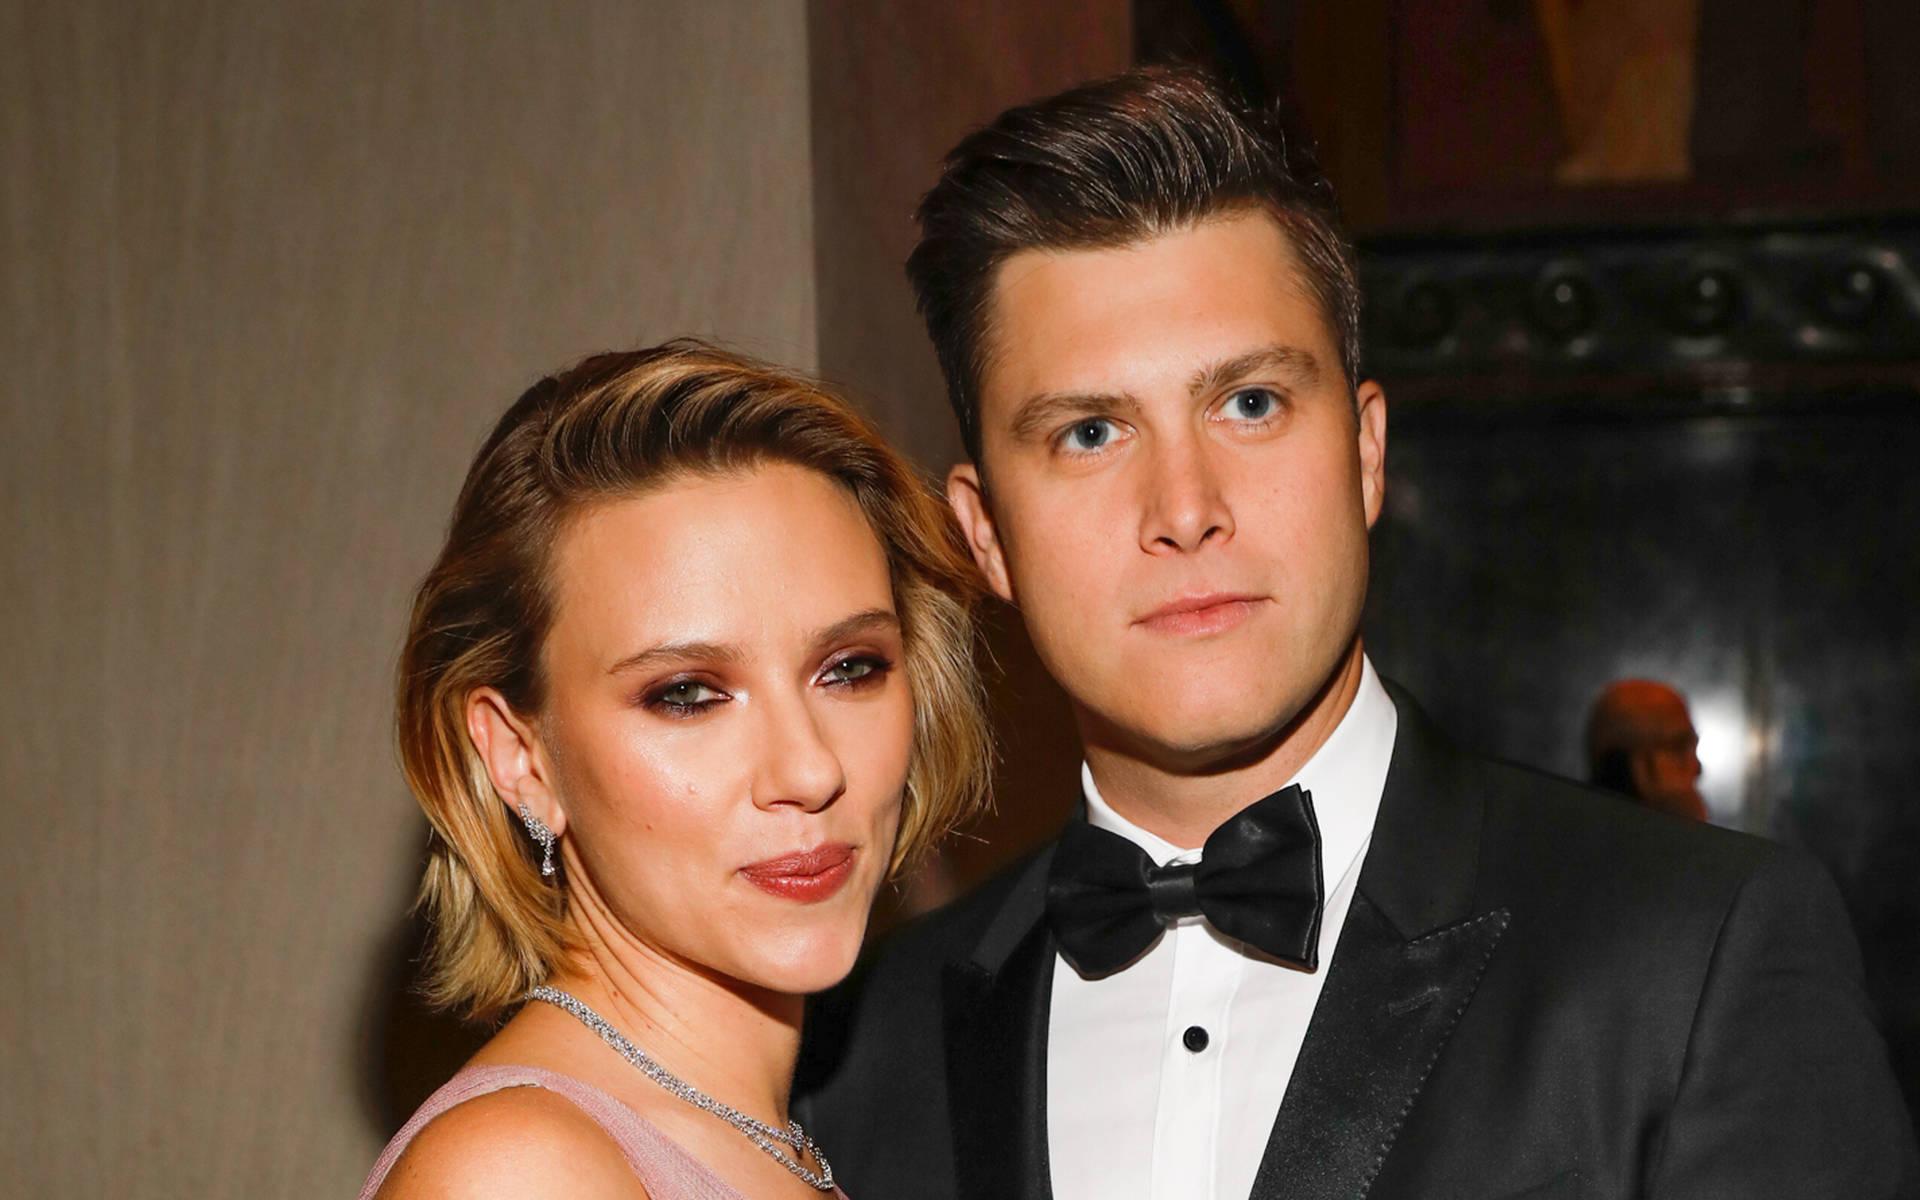 Scarlett Johansson Surprised By Colin Jost Proposal The Tango